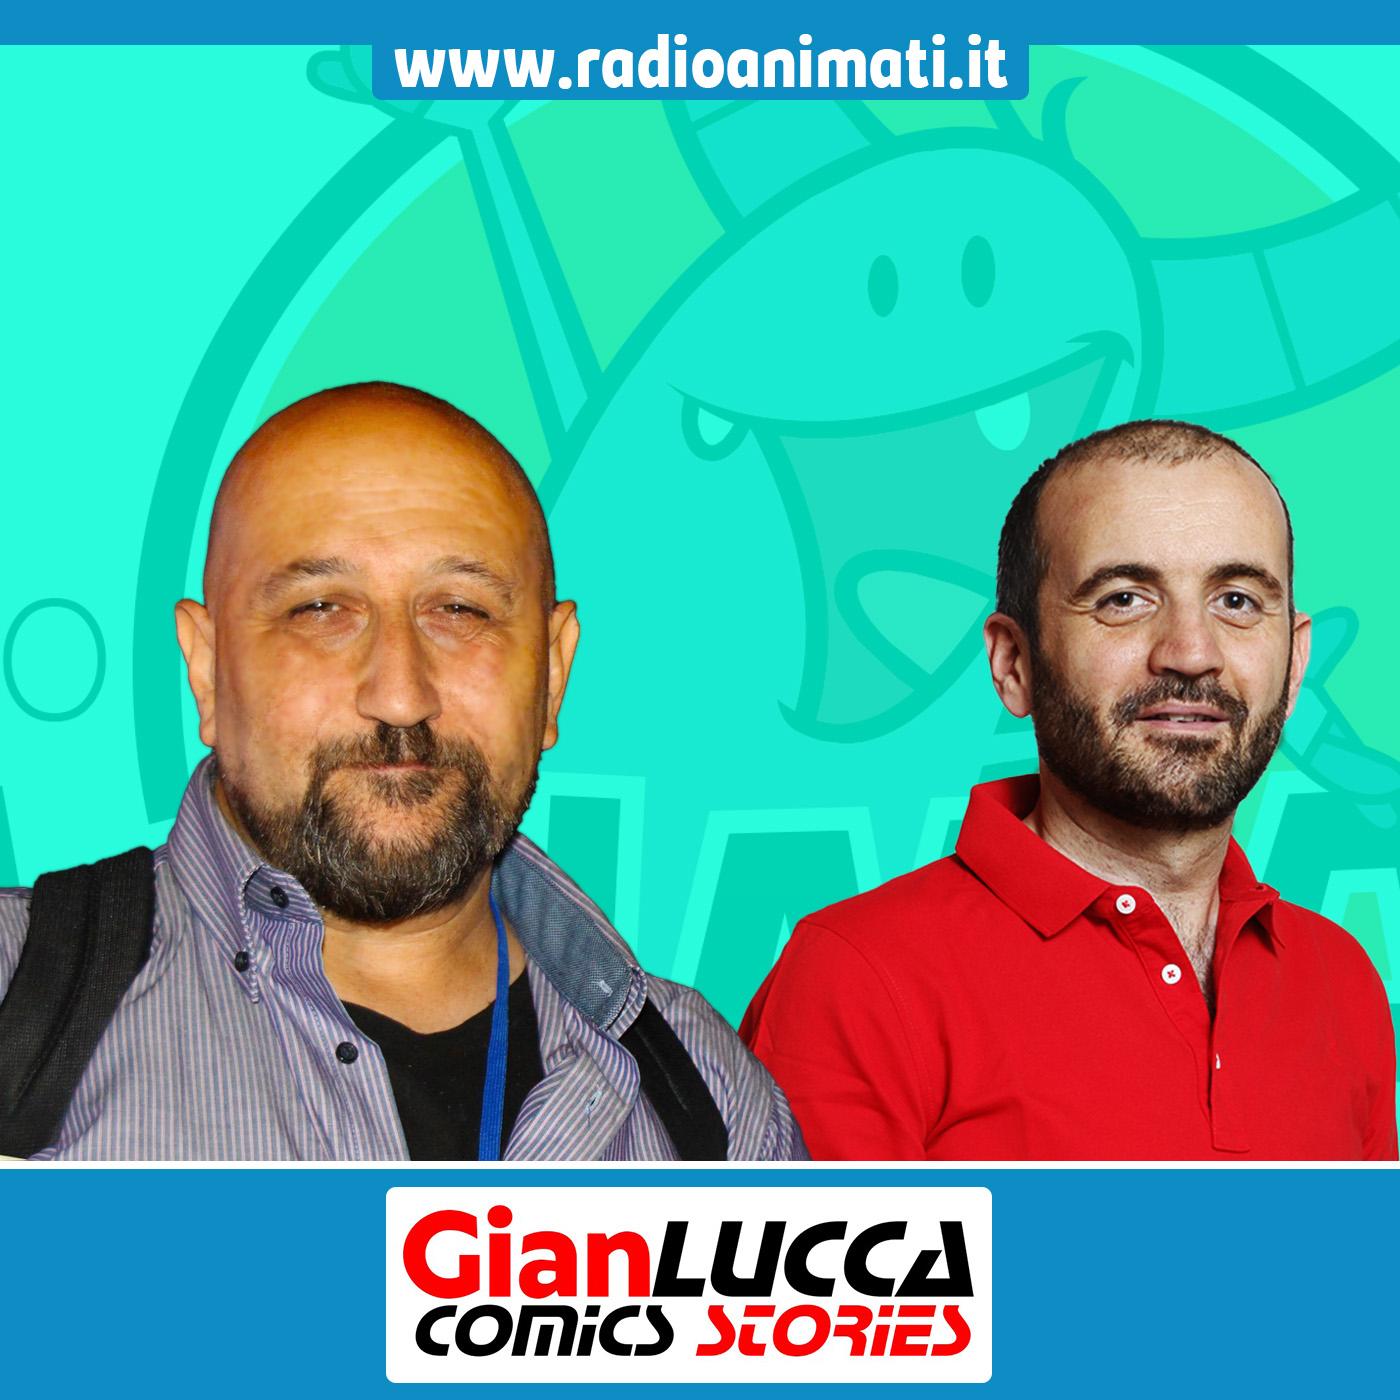 GianLucca Comics Stories